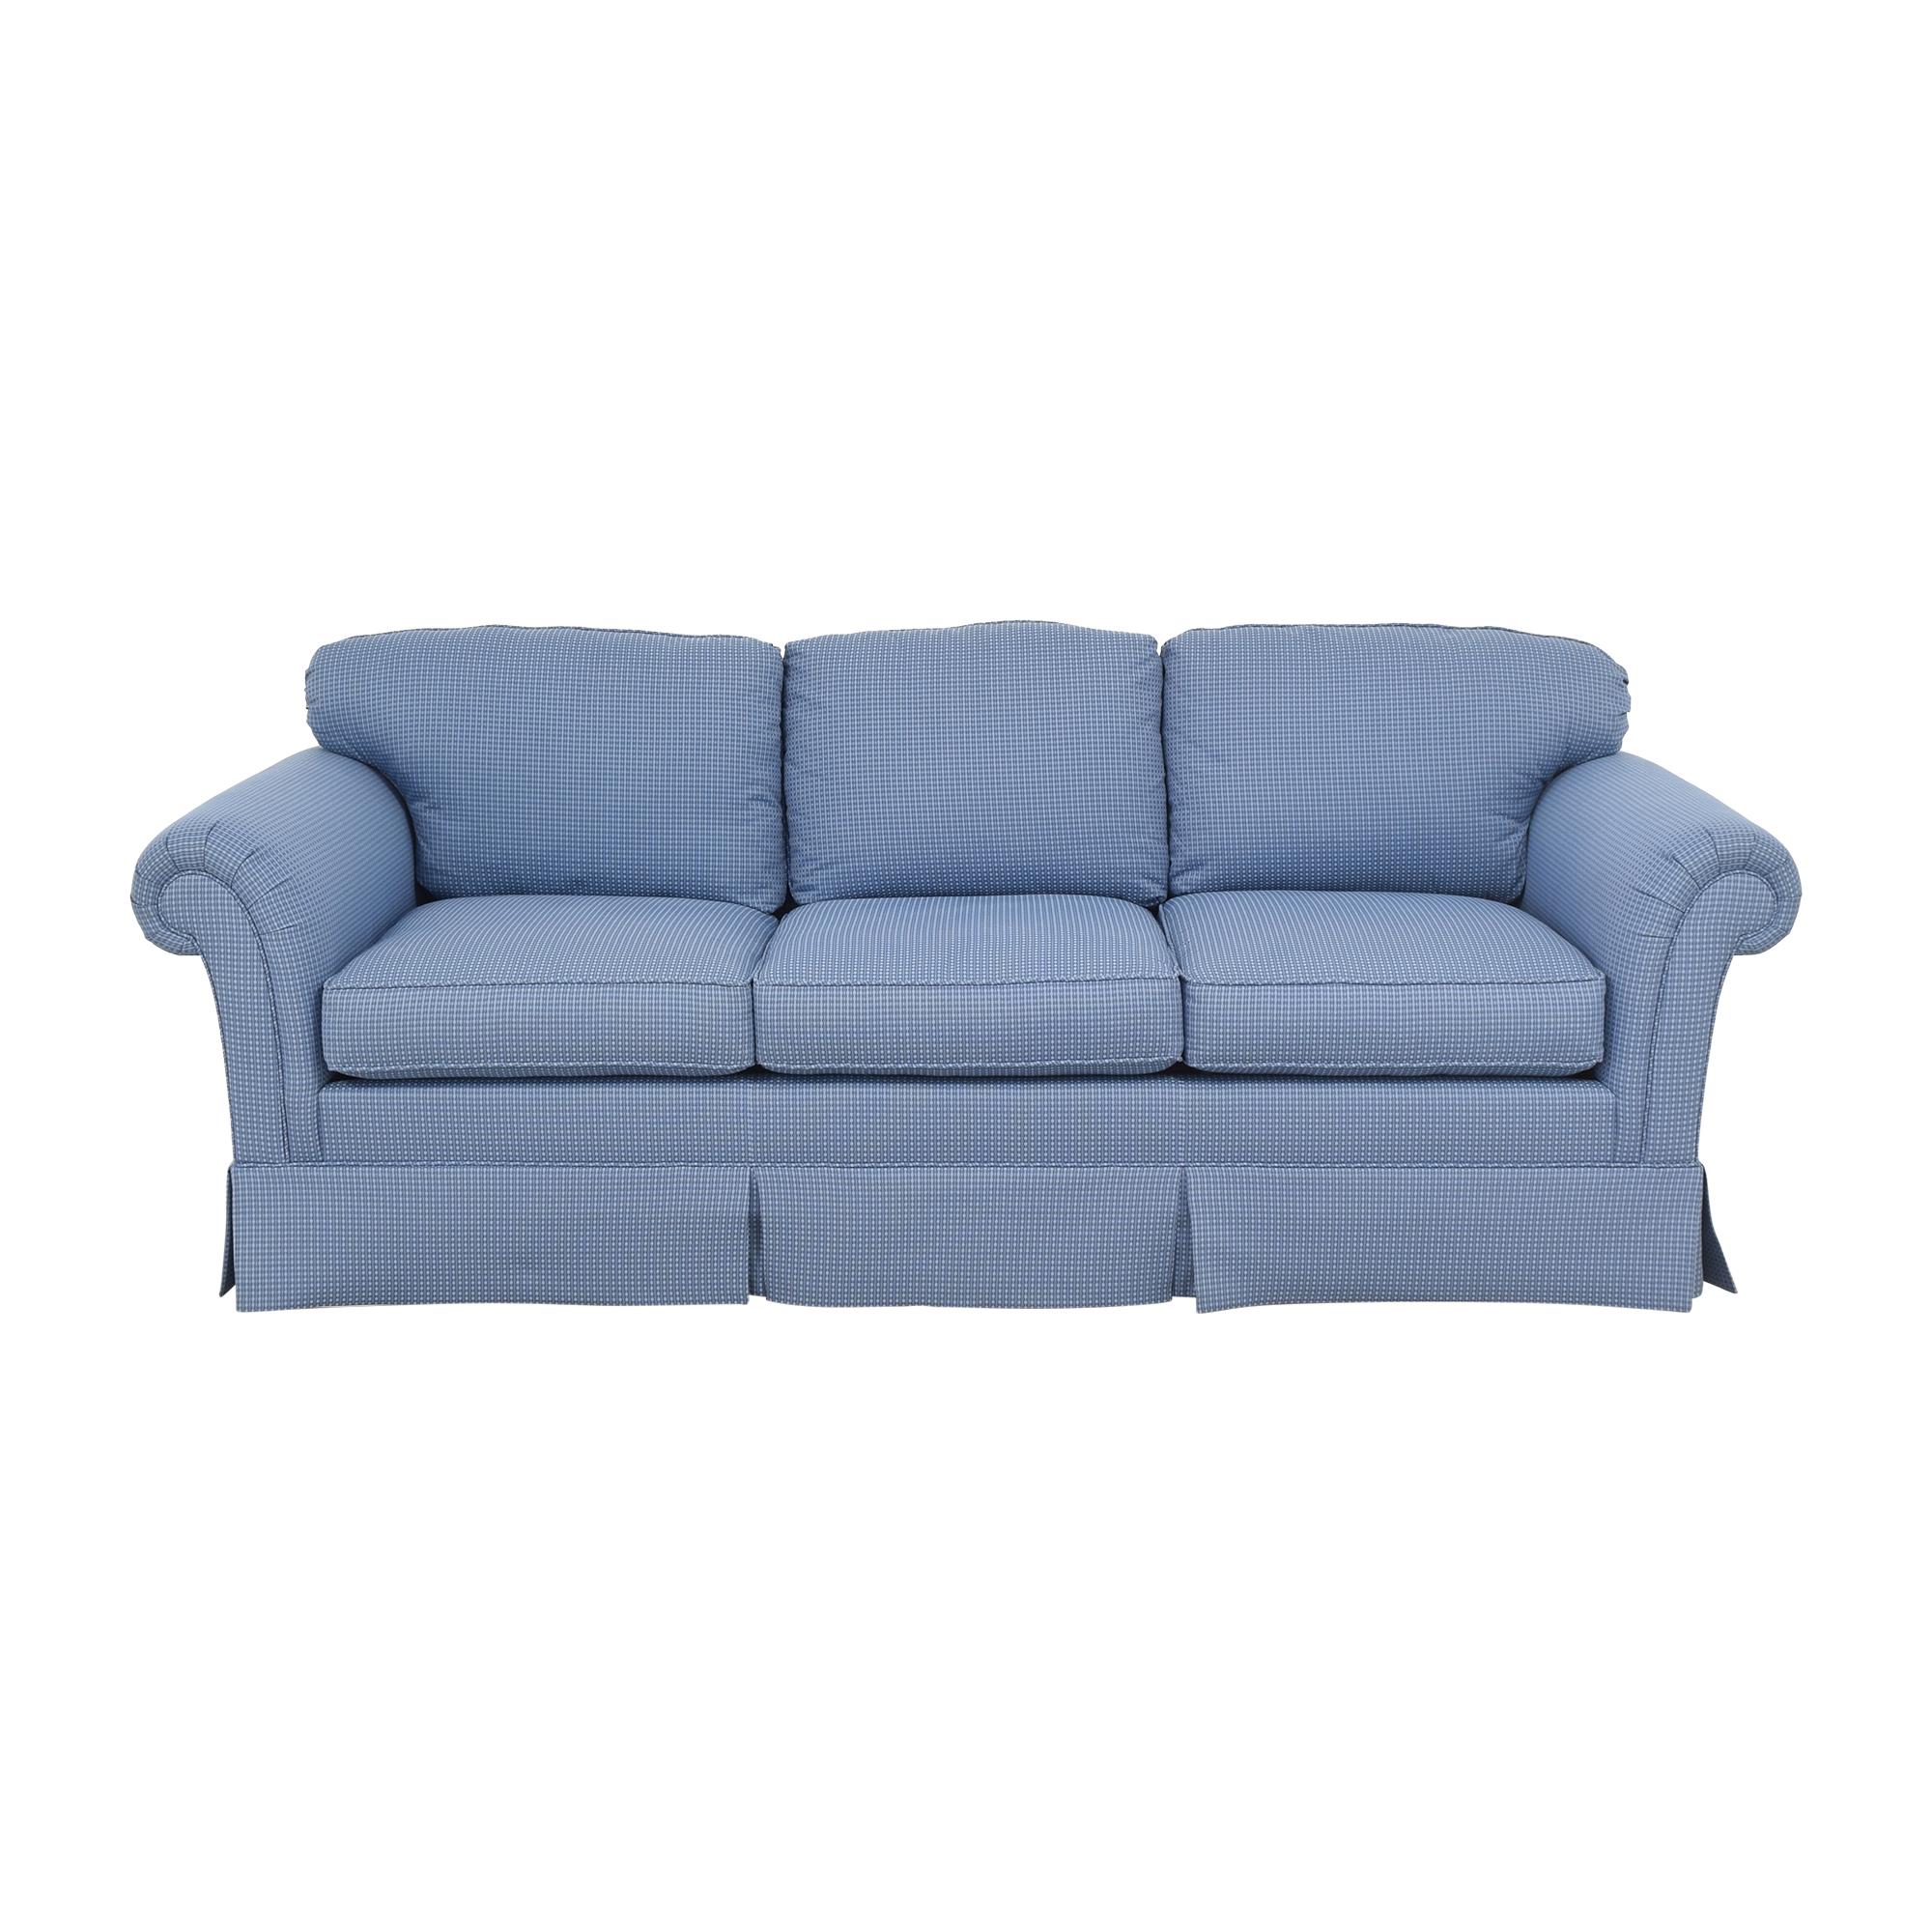 Kindel Kindel Sleigh Arm Sofa nj